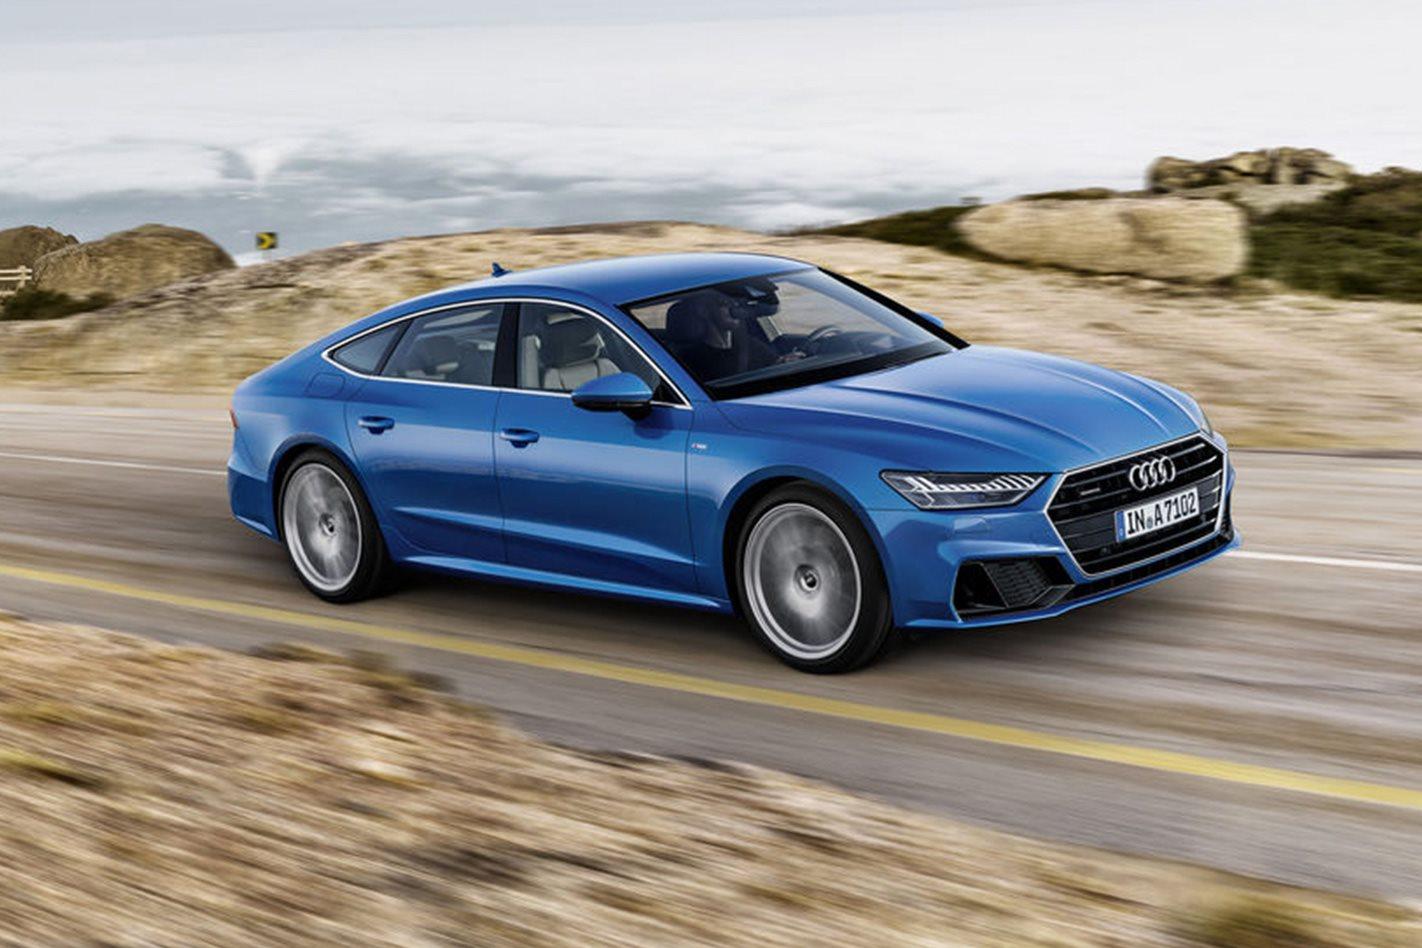 2019-Audi-A7-Sportback-drive.jpg